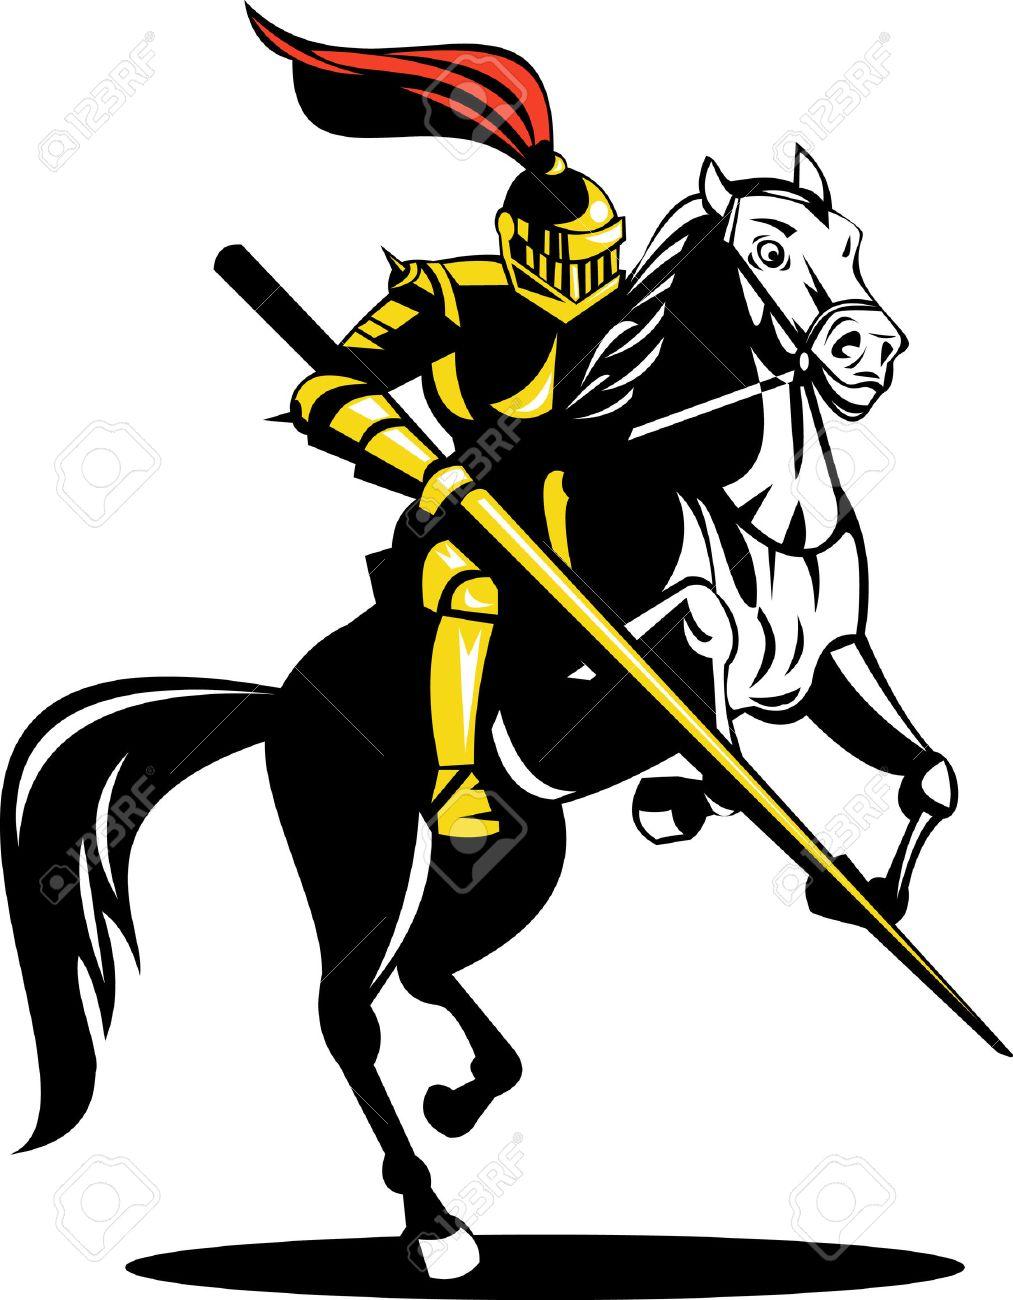 Knight on horseback with lance.